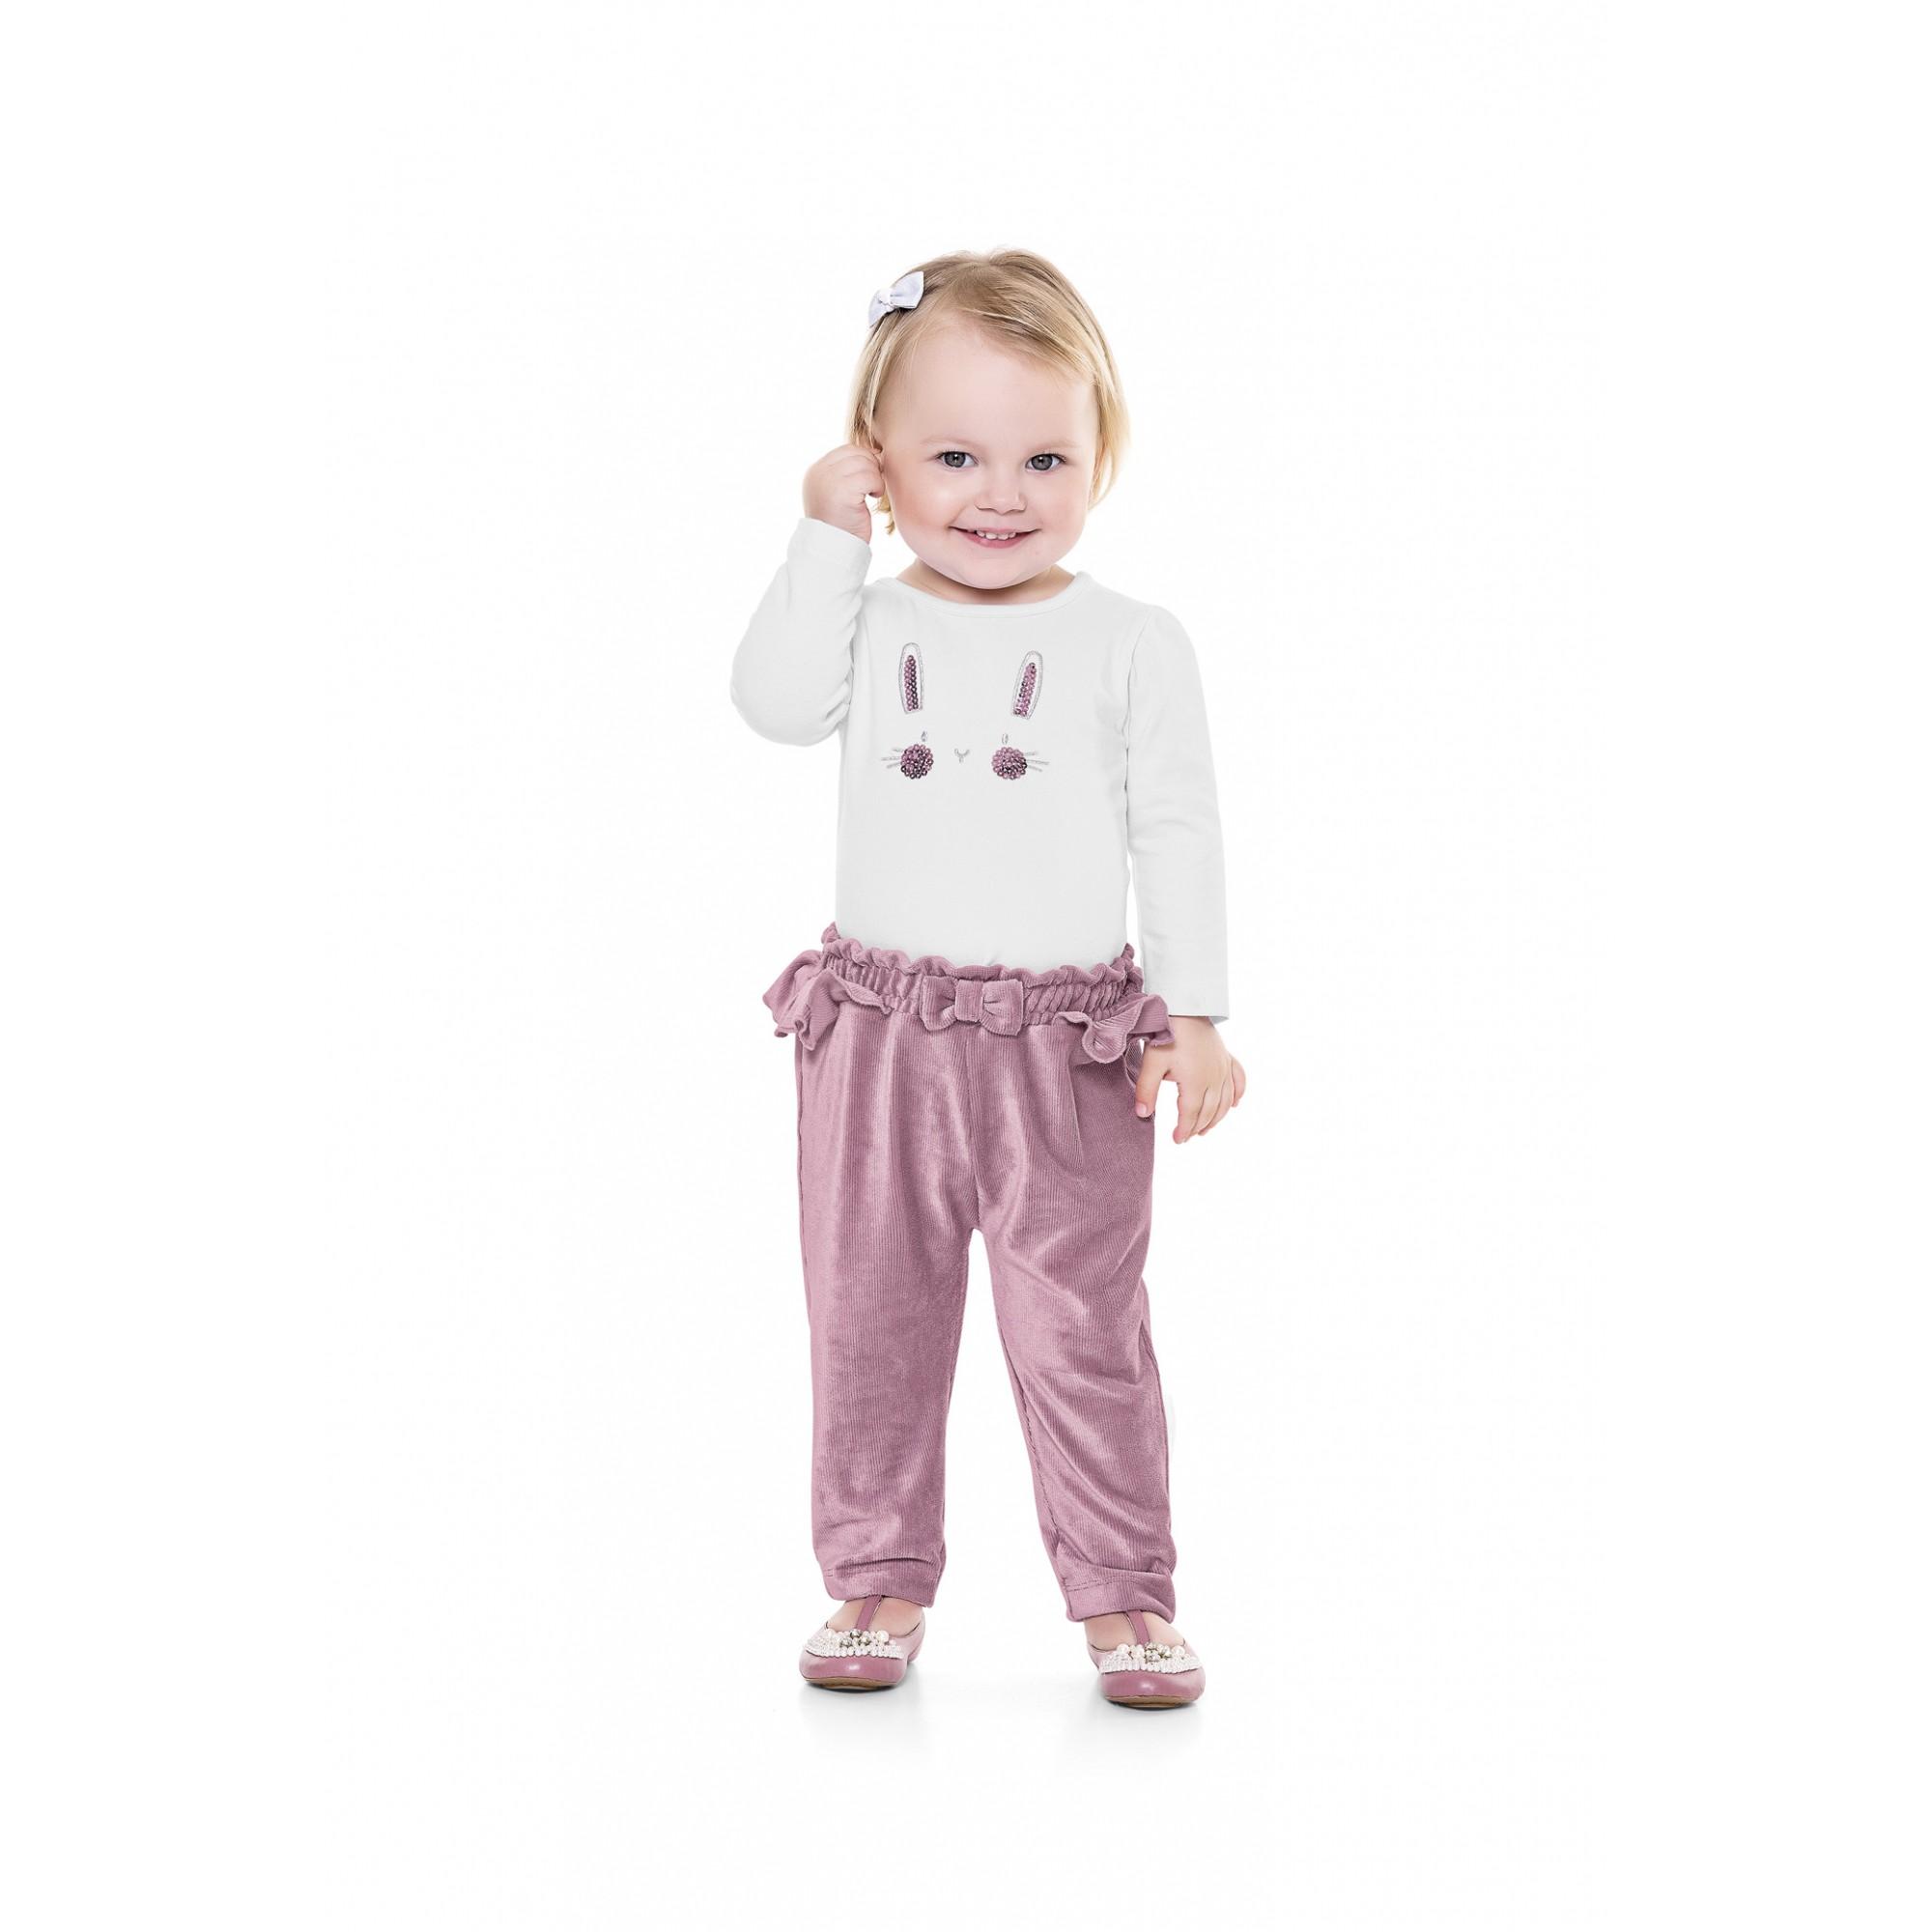 Conjunto infantil feminino para bebê Calça aveludada e Blusa manga longa Playground